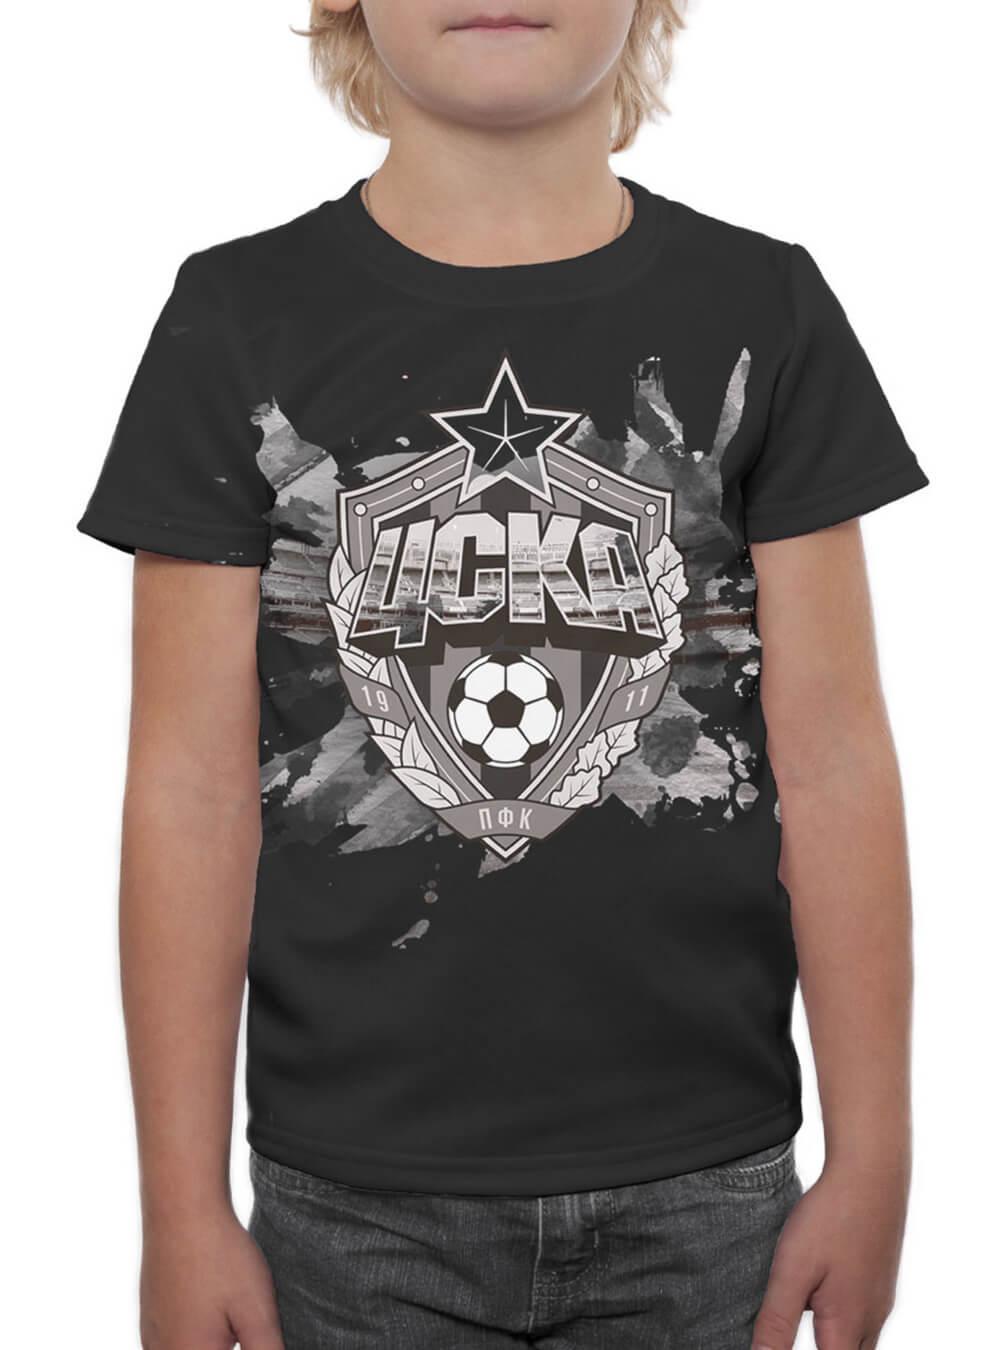 Футболка детская Эмблема черная (110)Одежда на заказ<br>Футболка детская Эмблема черная<br>